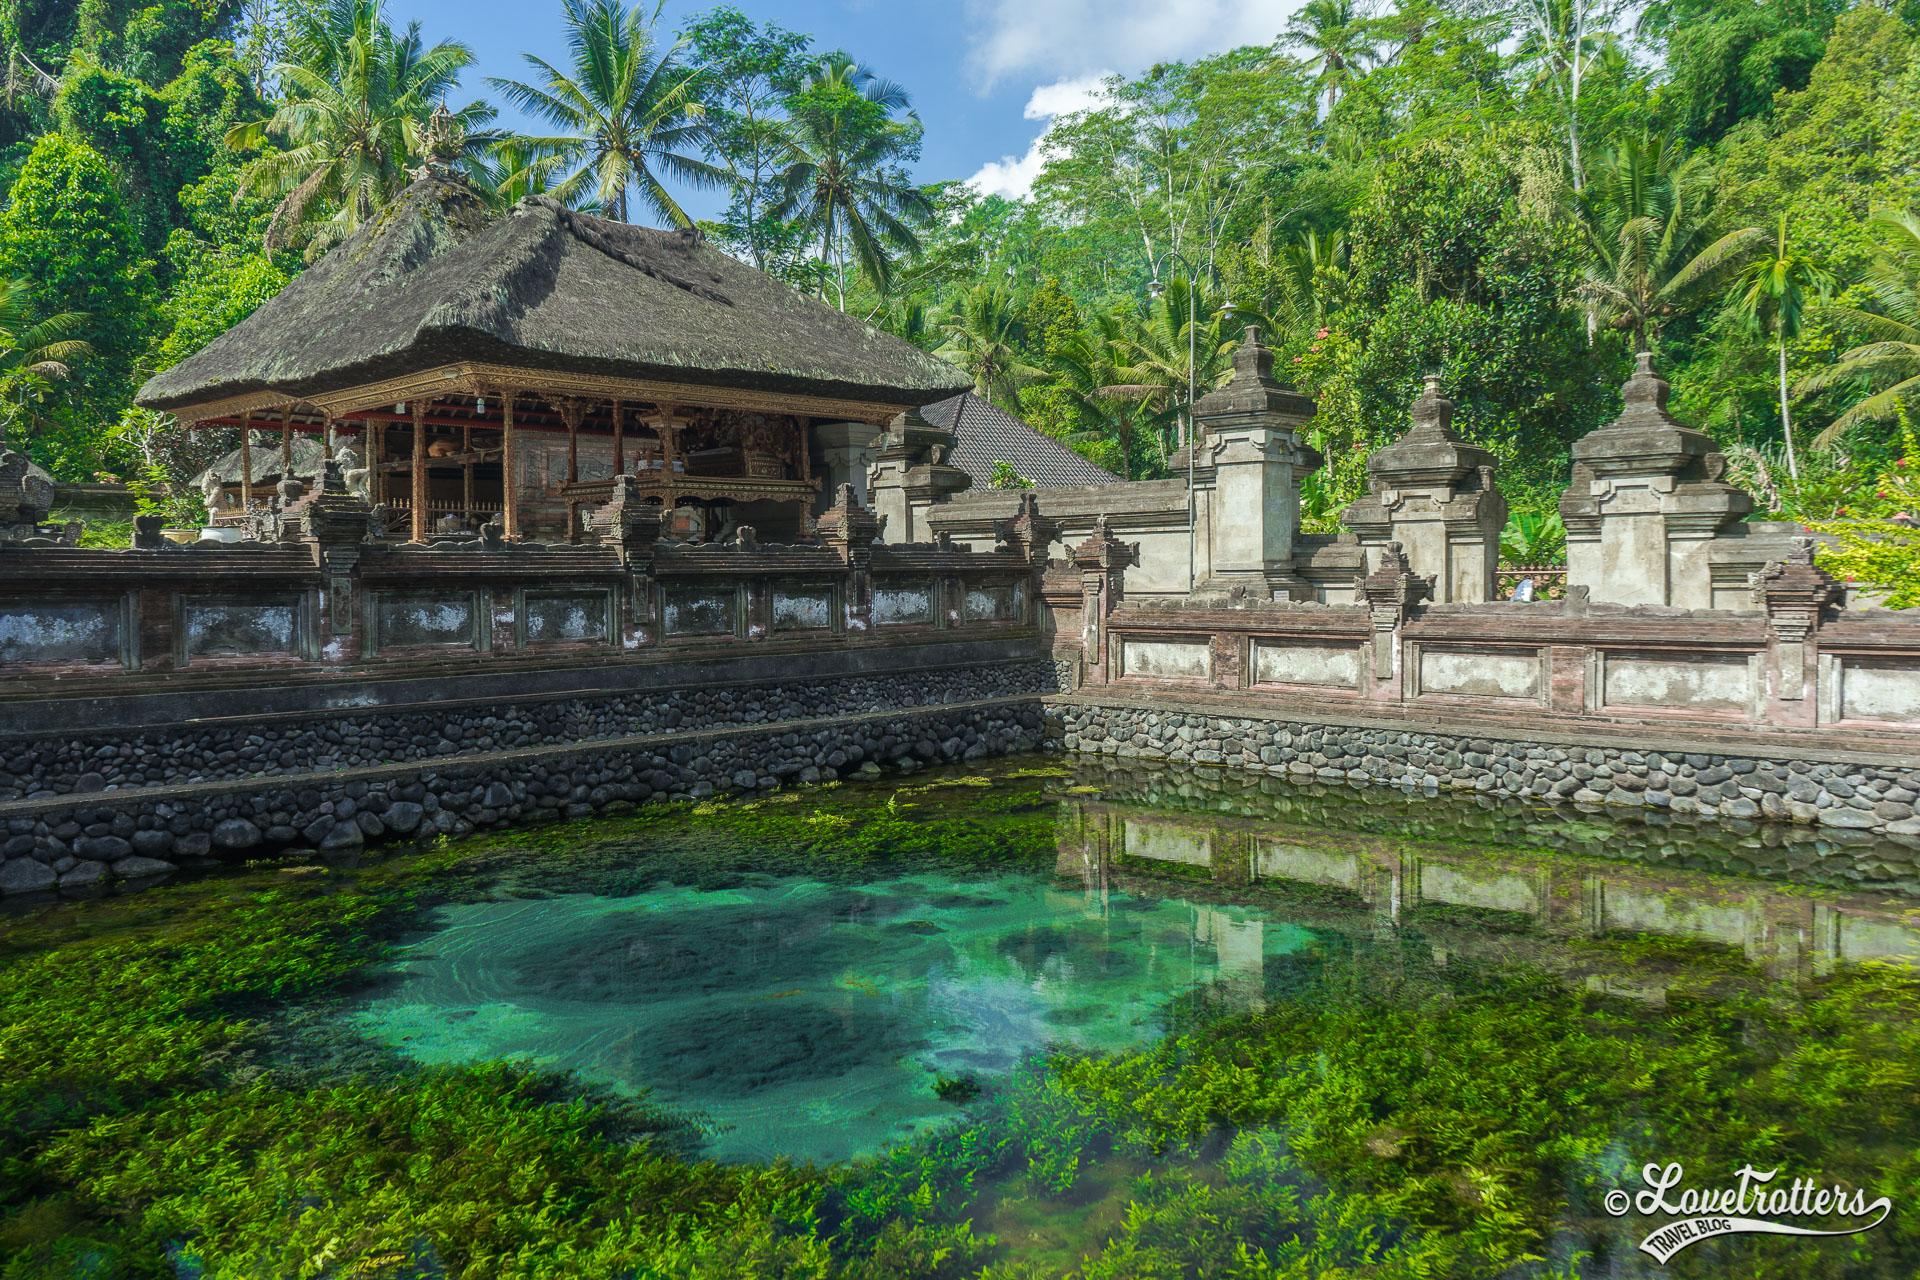 Voyage à Bali - Temple Tirta Empul près d'Ubud